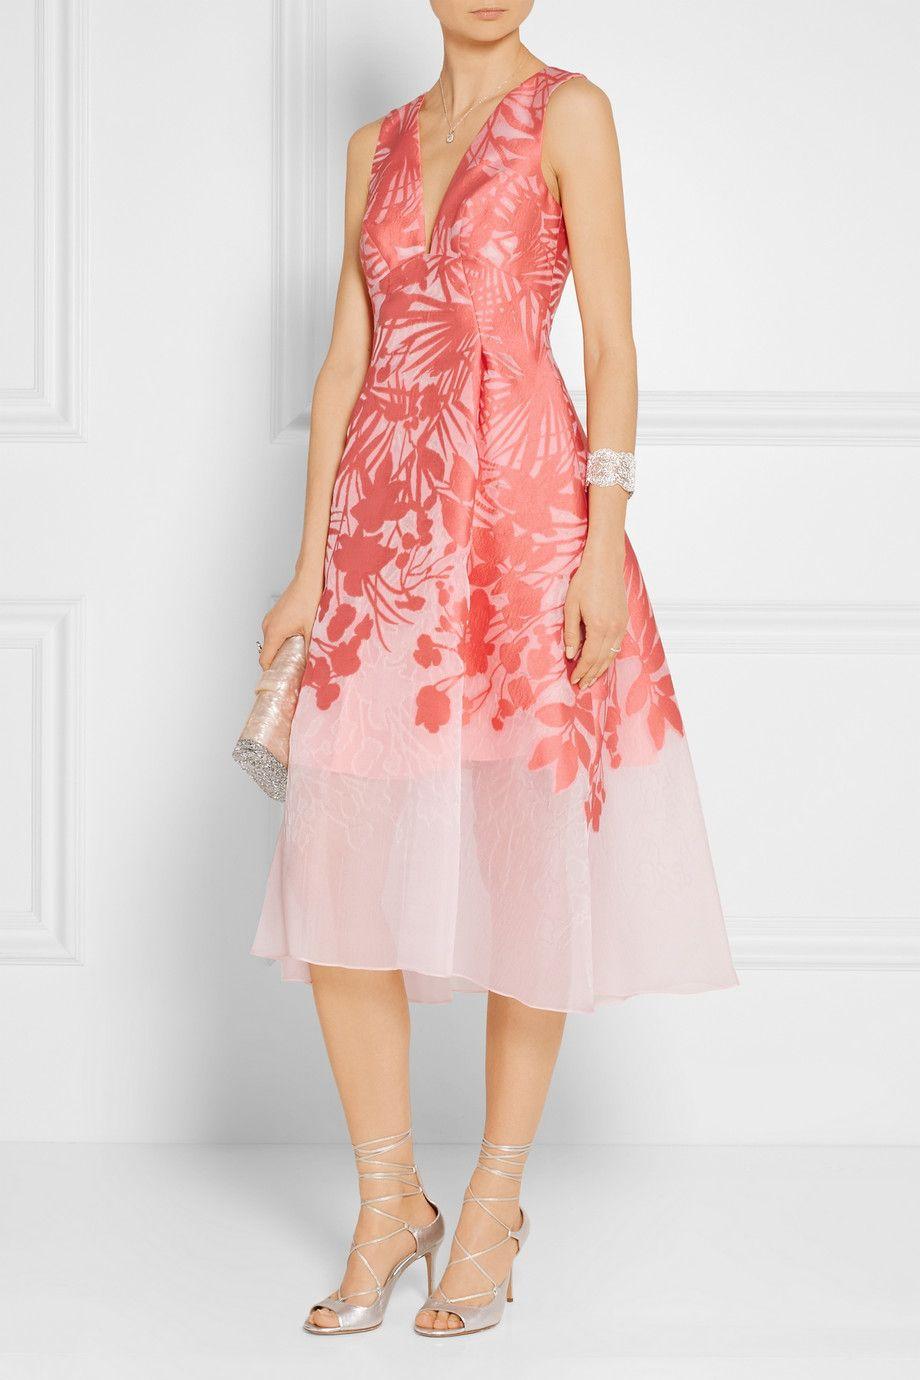 LELA ROSE Floral organza-jacquard dress | Fashion Lust | Pinterest ...